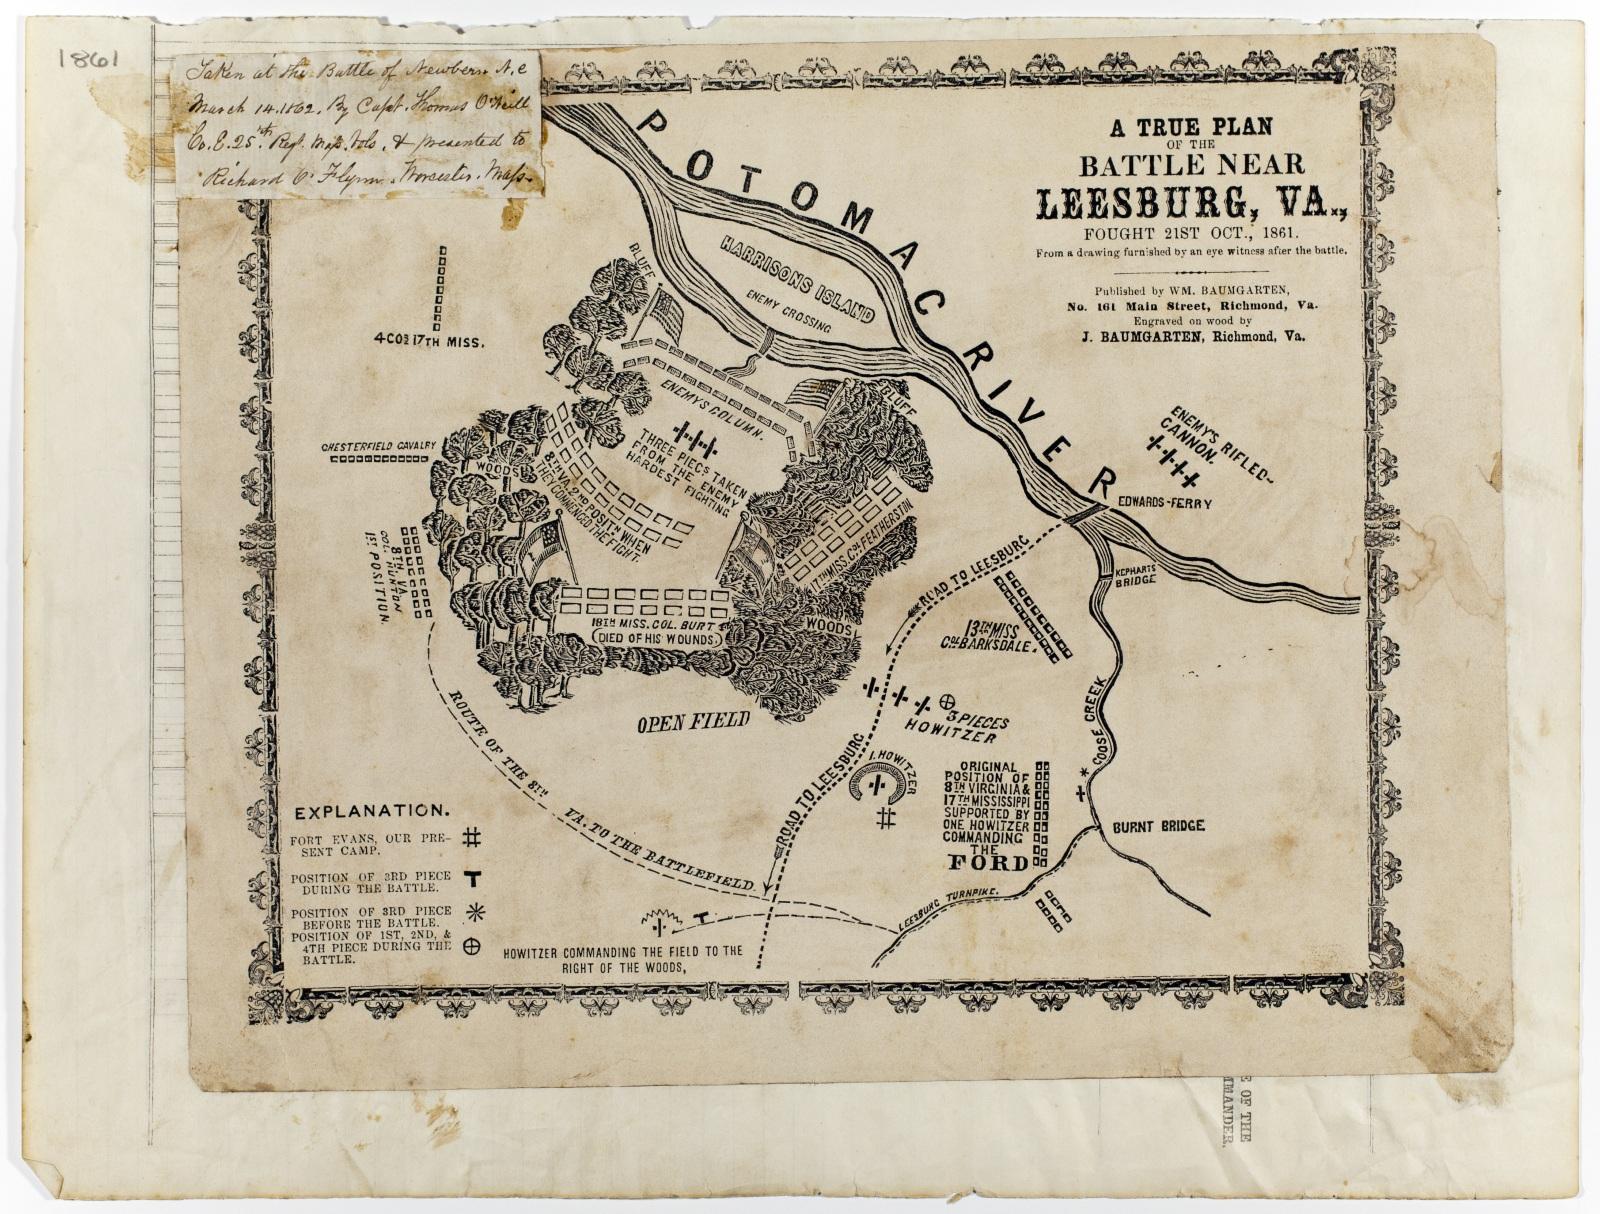 U0026quot A True Plan Of The Battle Near Leesburg  Va   Fought 21st